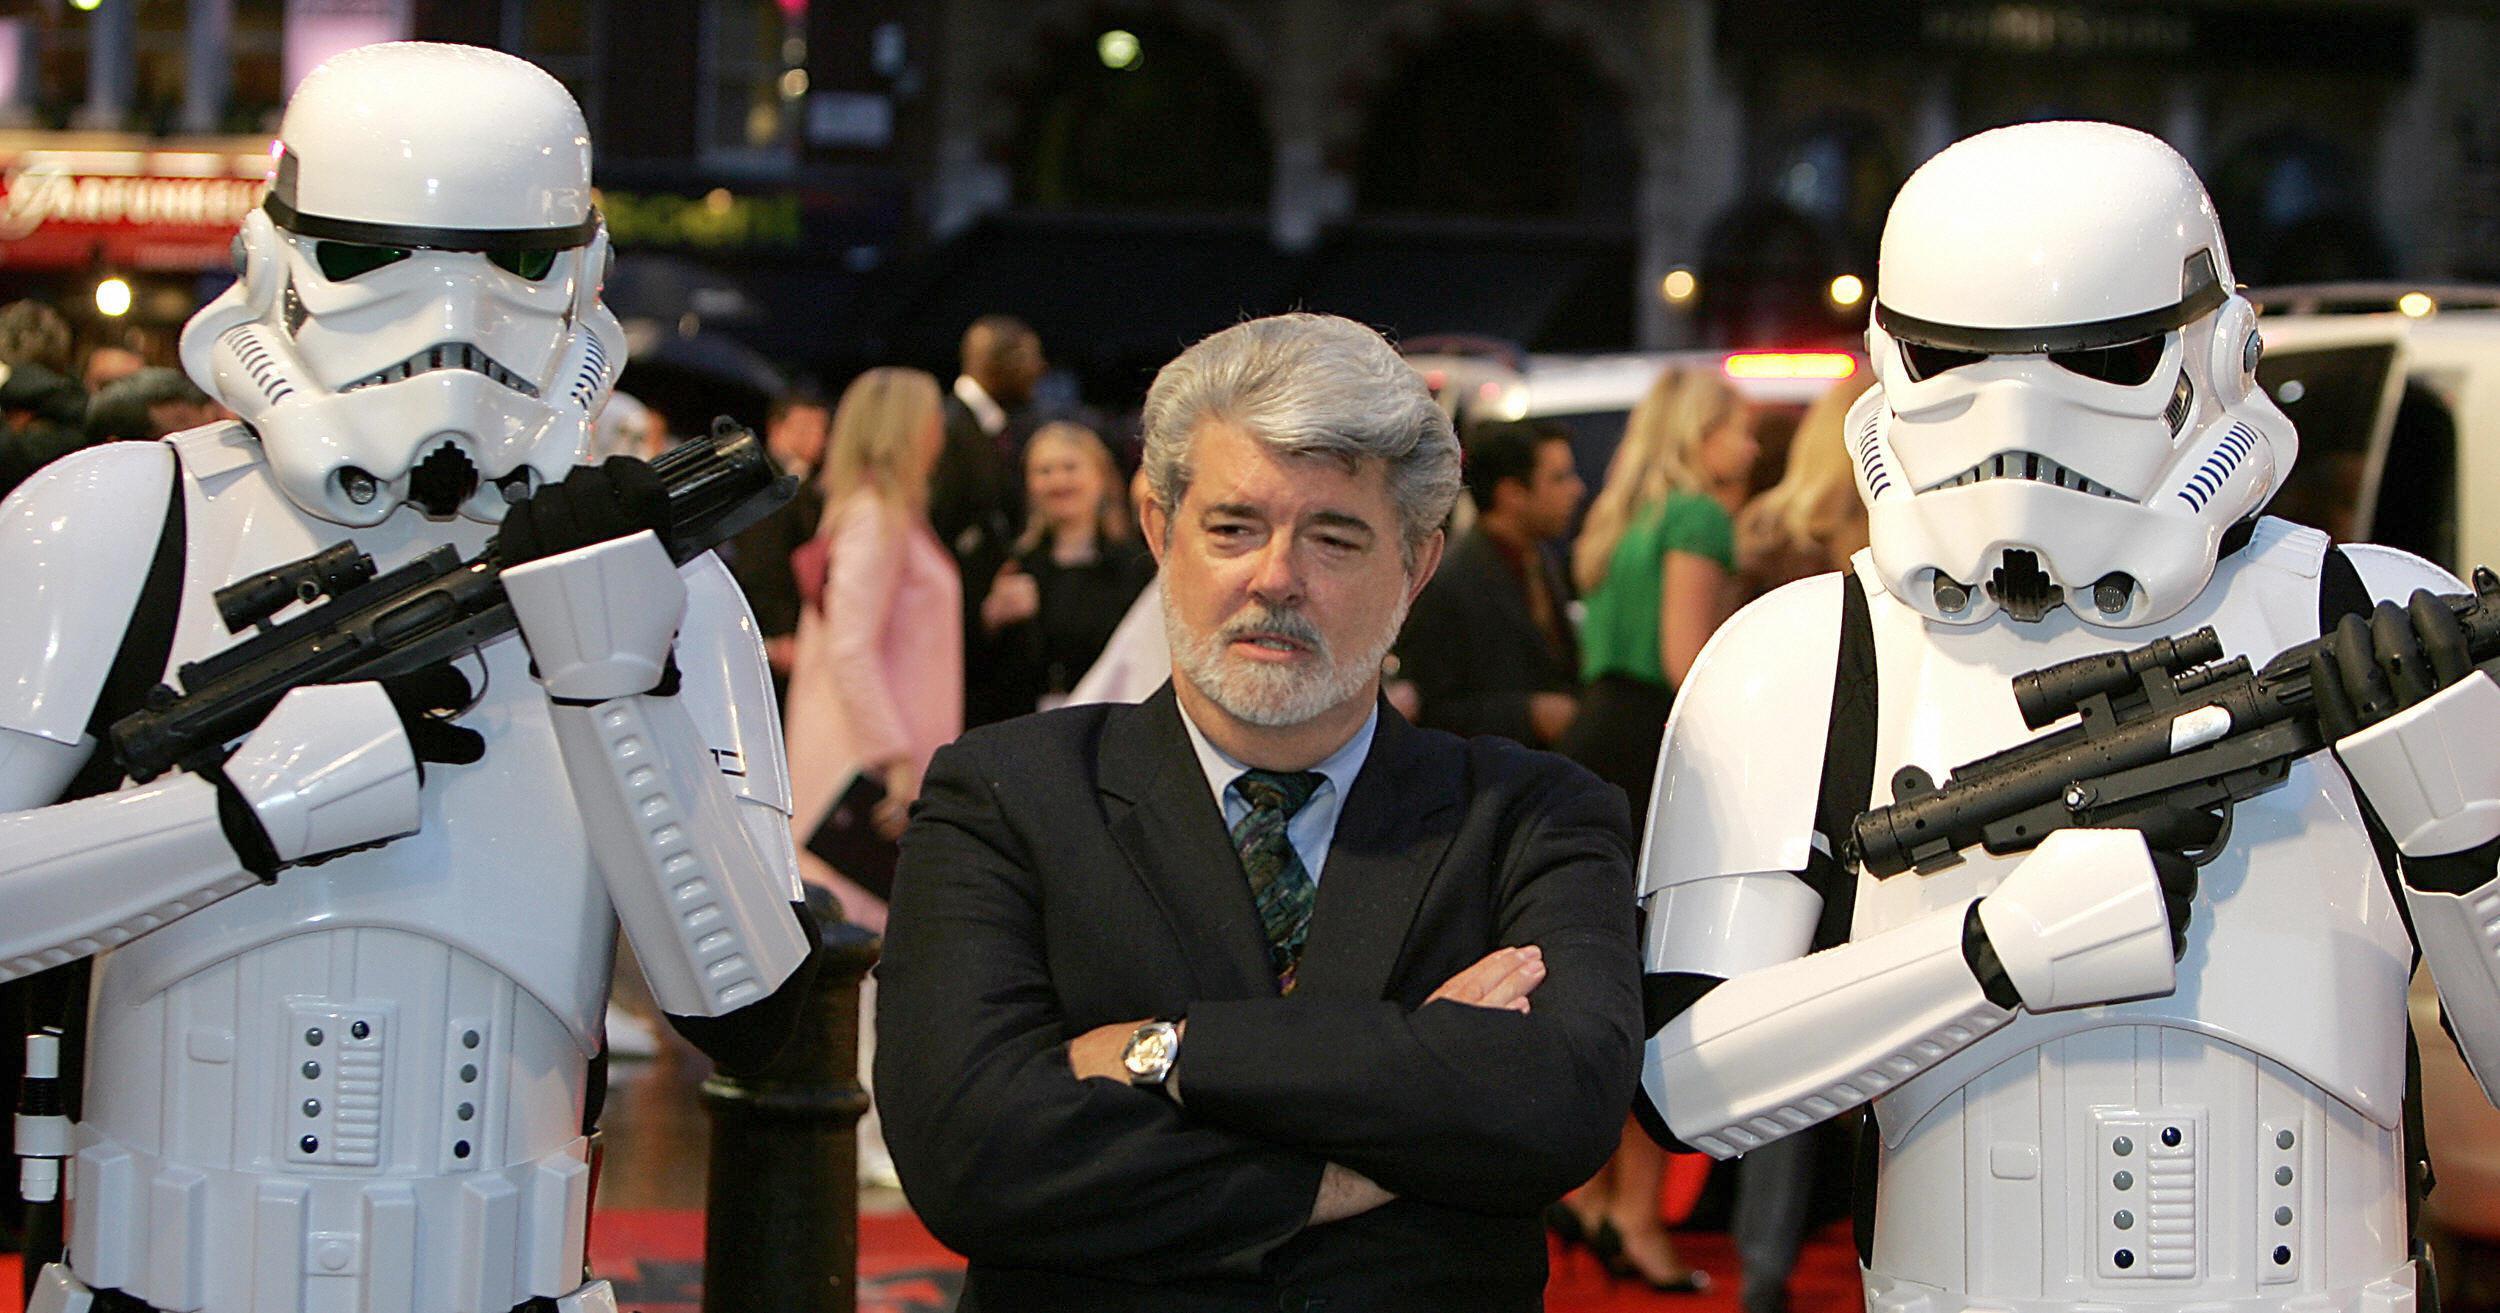 George Lucas Ccfdbcdbbdeafcb